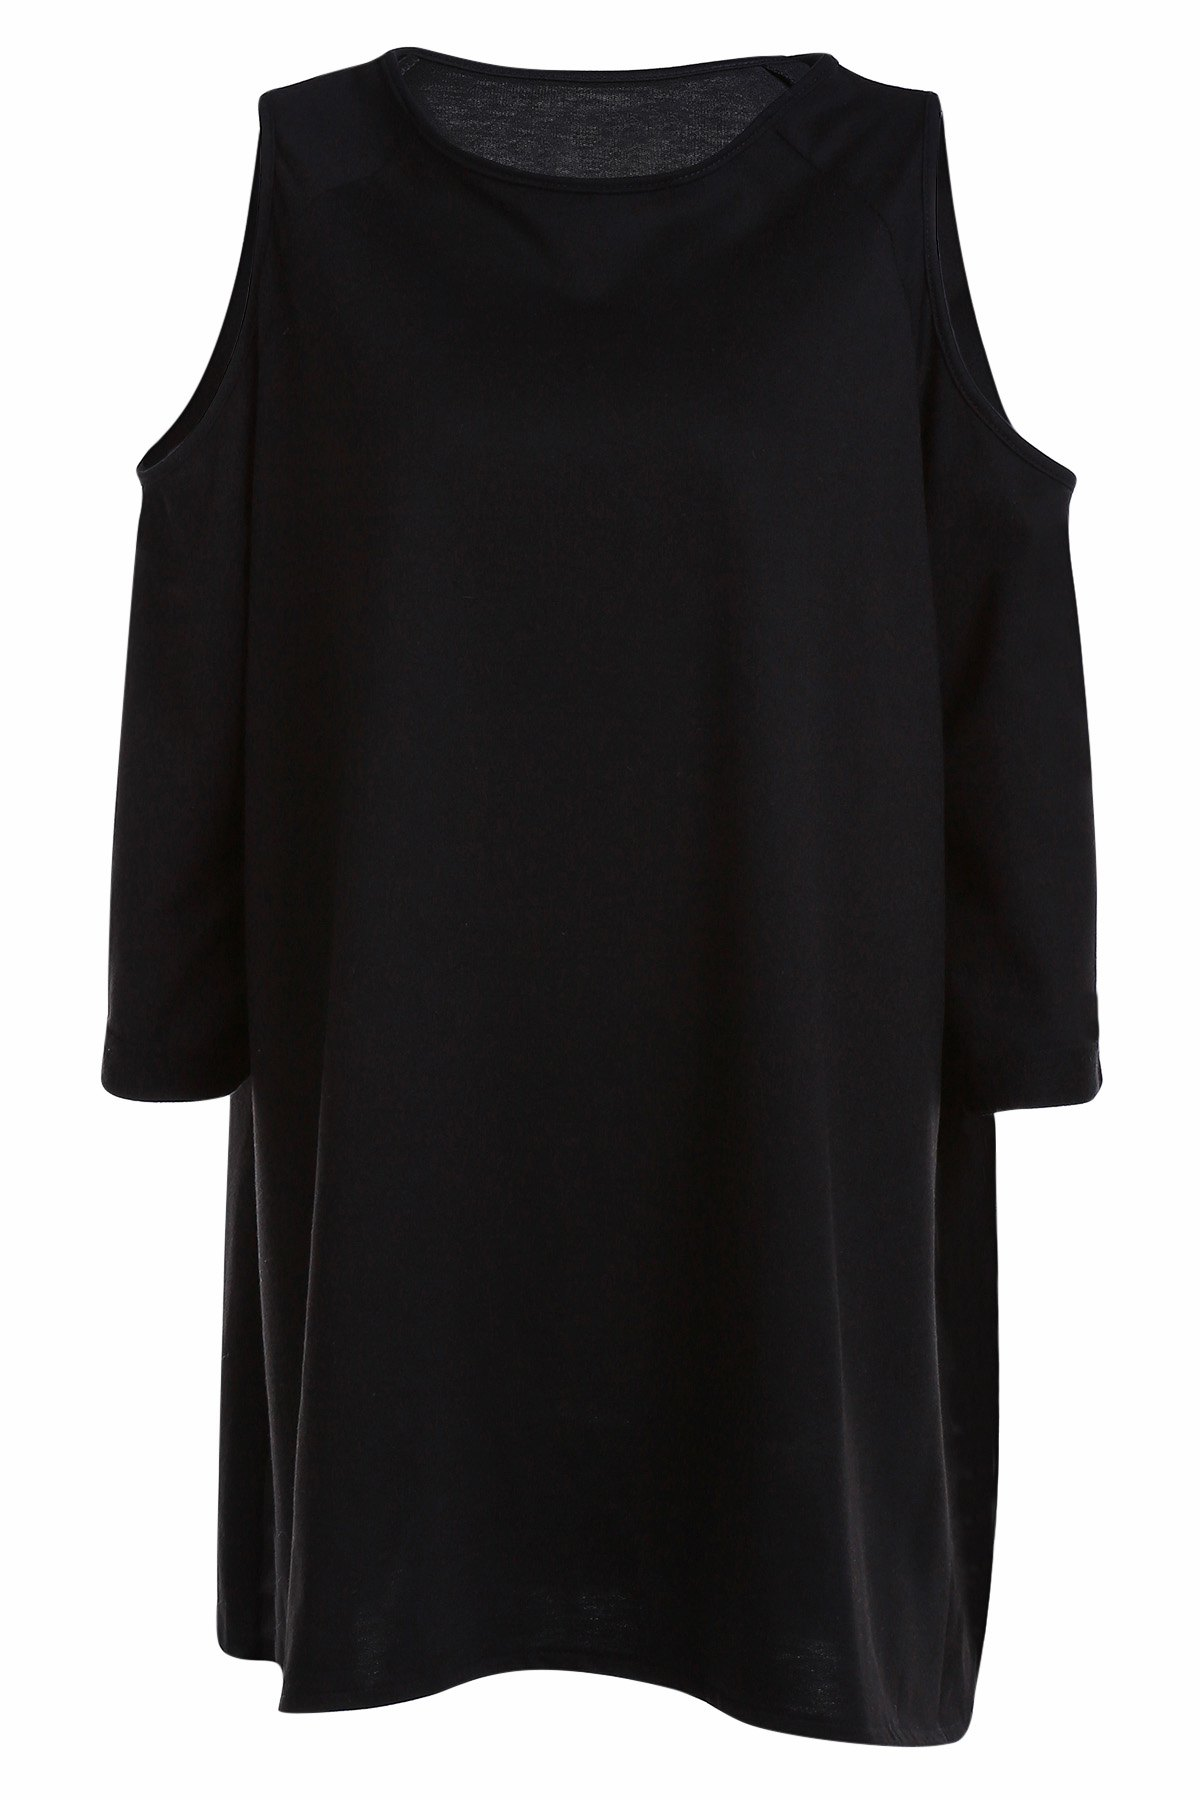 Round Collar Cold Shoulder Black T-Shirt